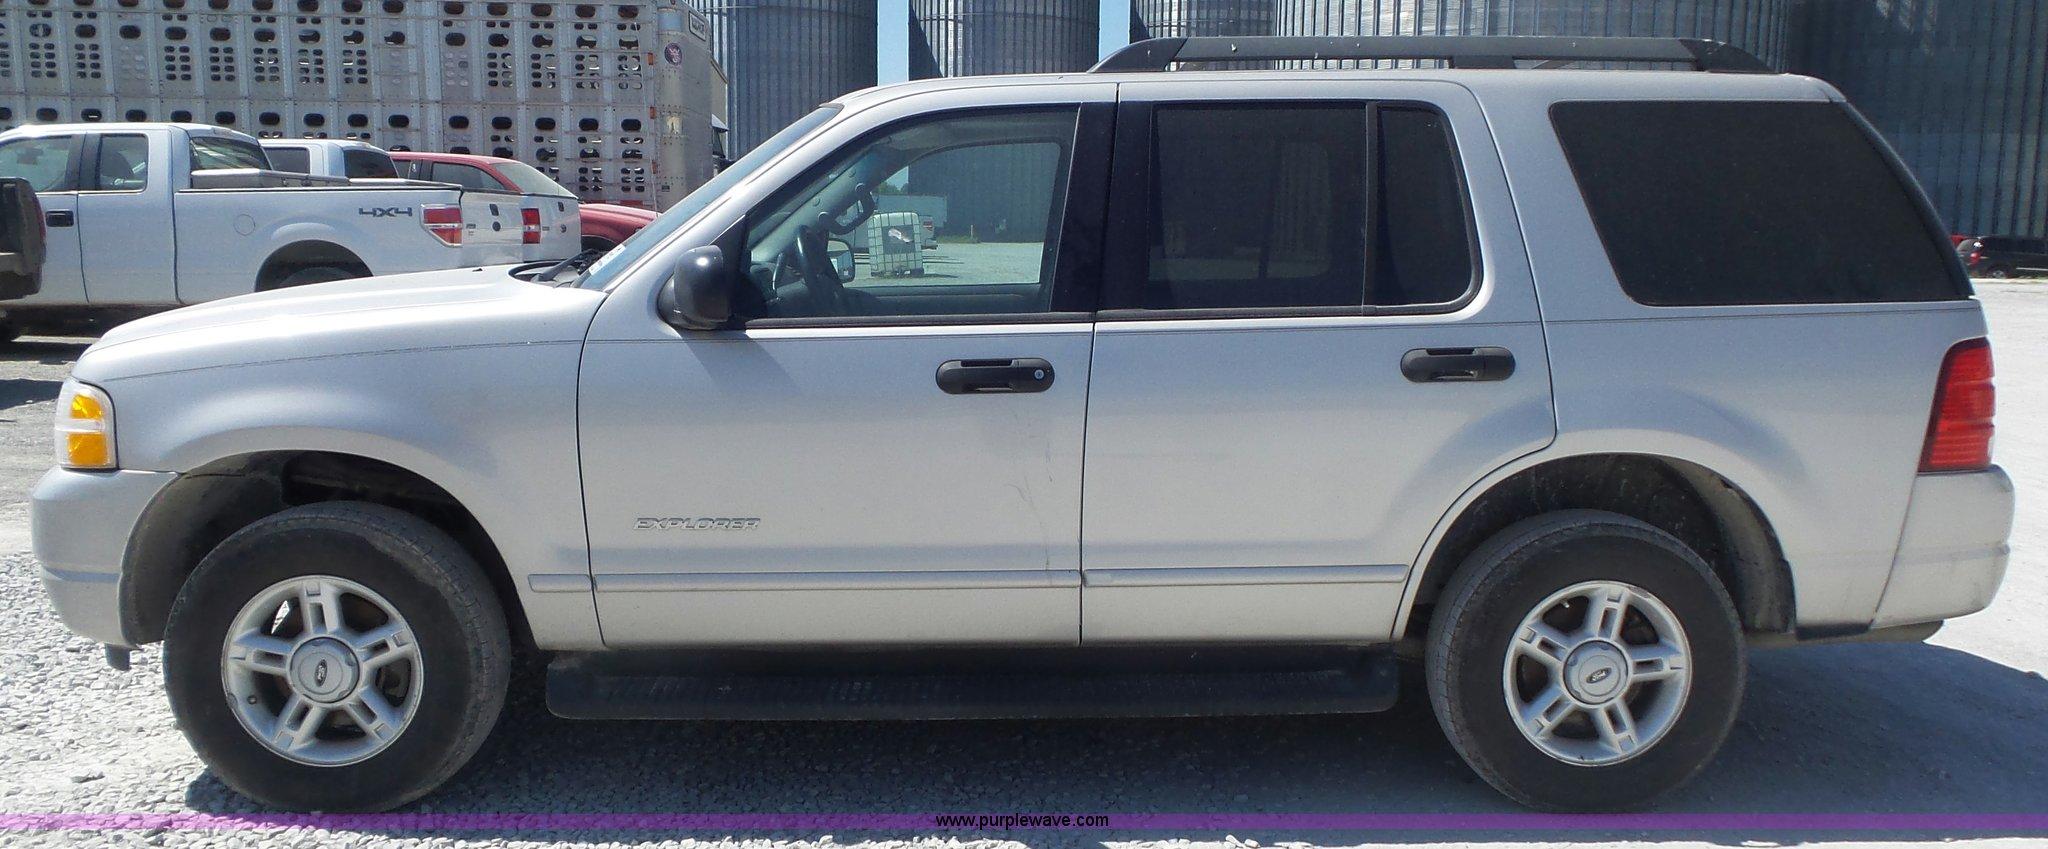 2005 ford explorer xlt suv full size in new window